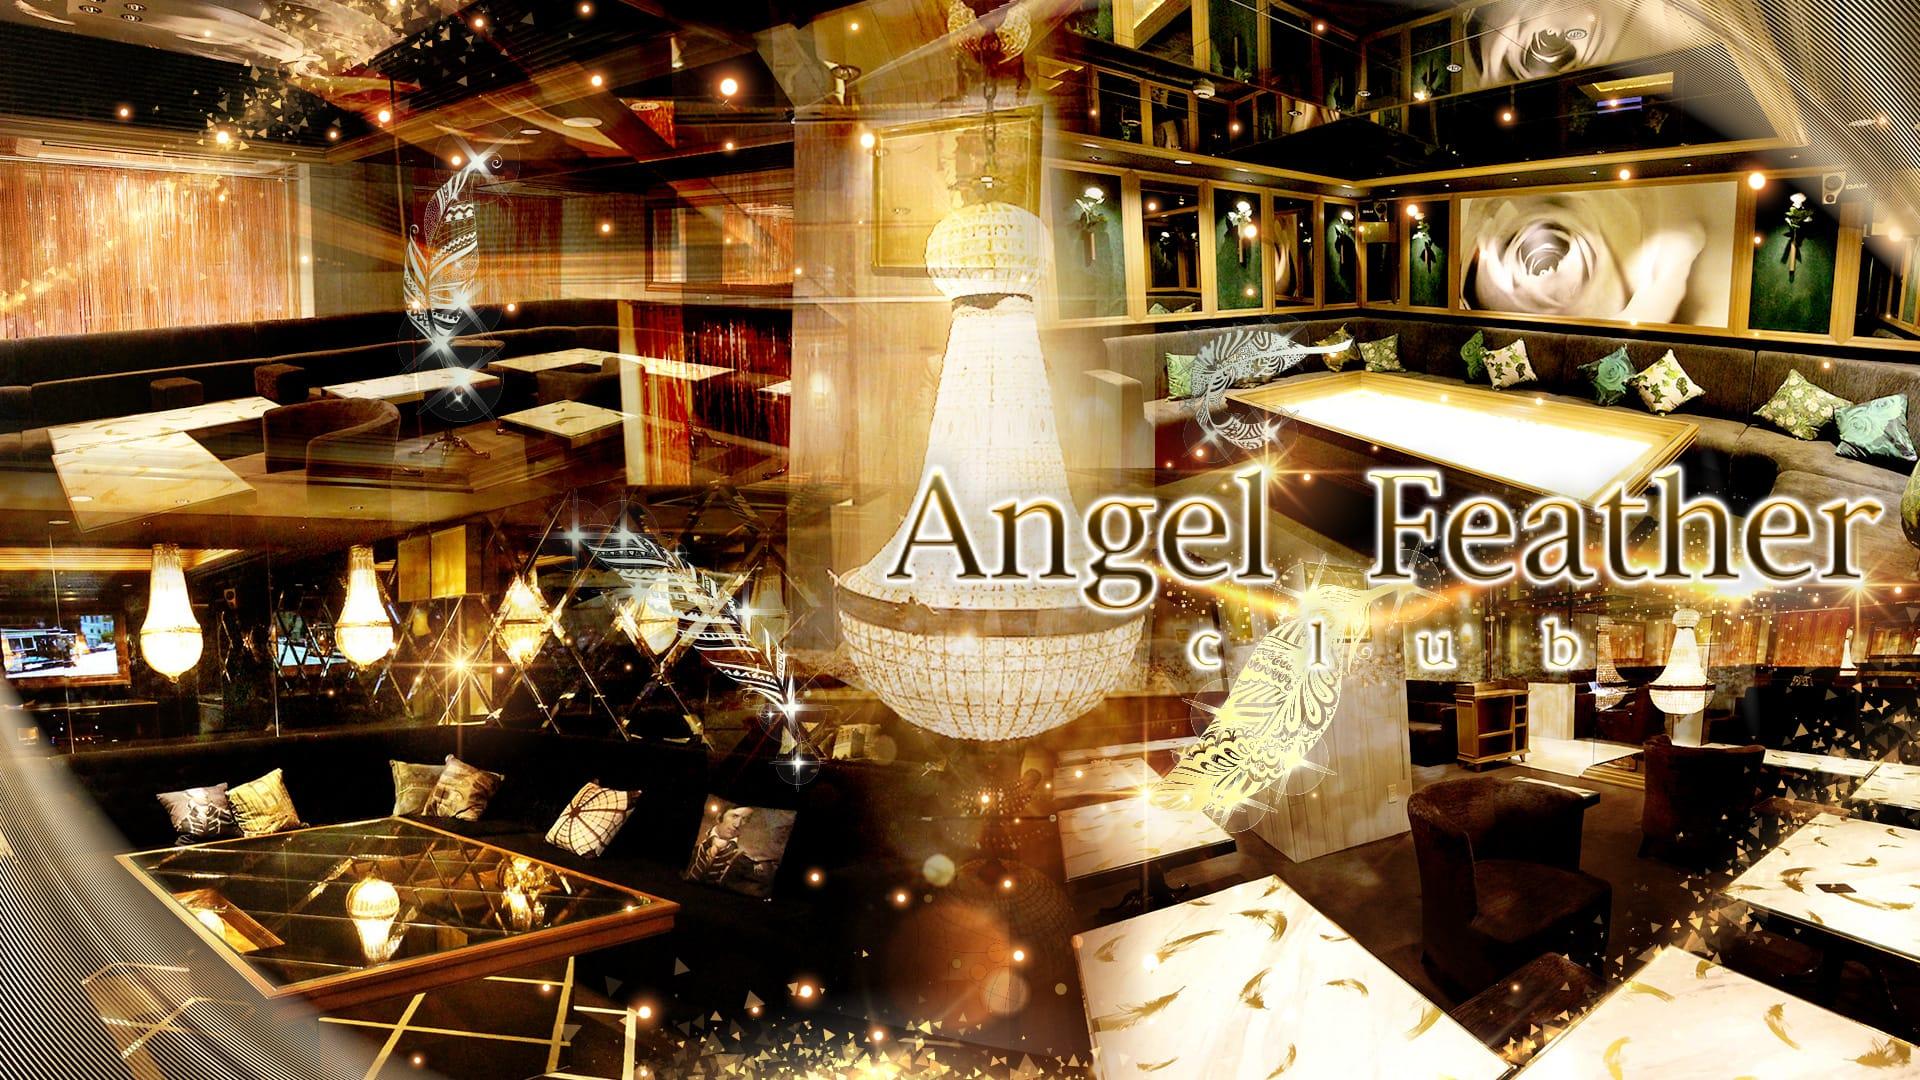 Angel Feather 池袋(エンジェルフェザー)  池袋キャバクラ TOP画像